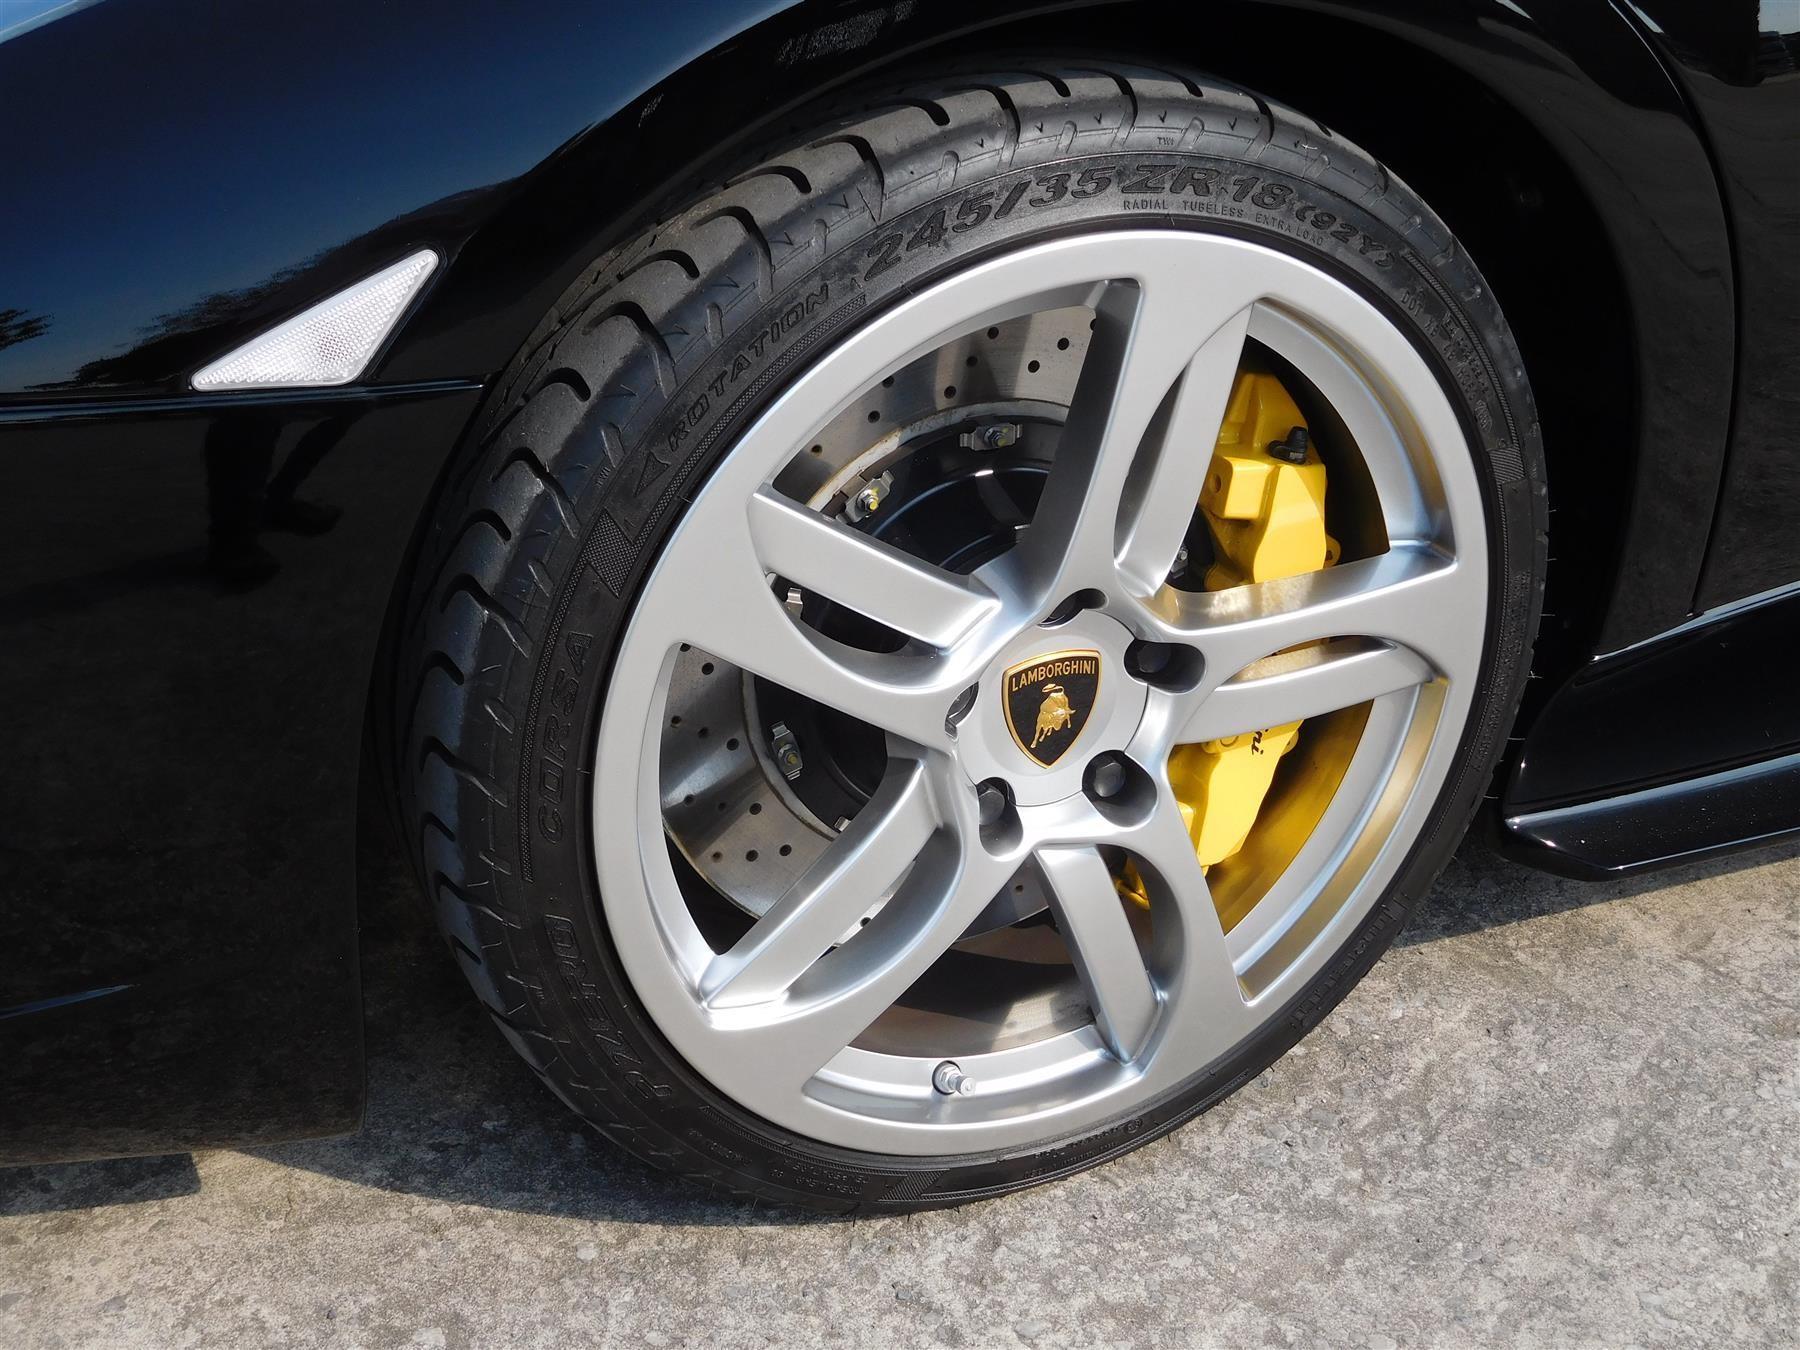 2007_Lamborghini_Murcielago_sale-0008